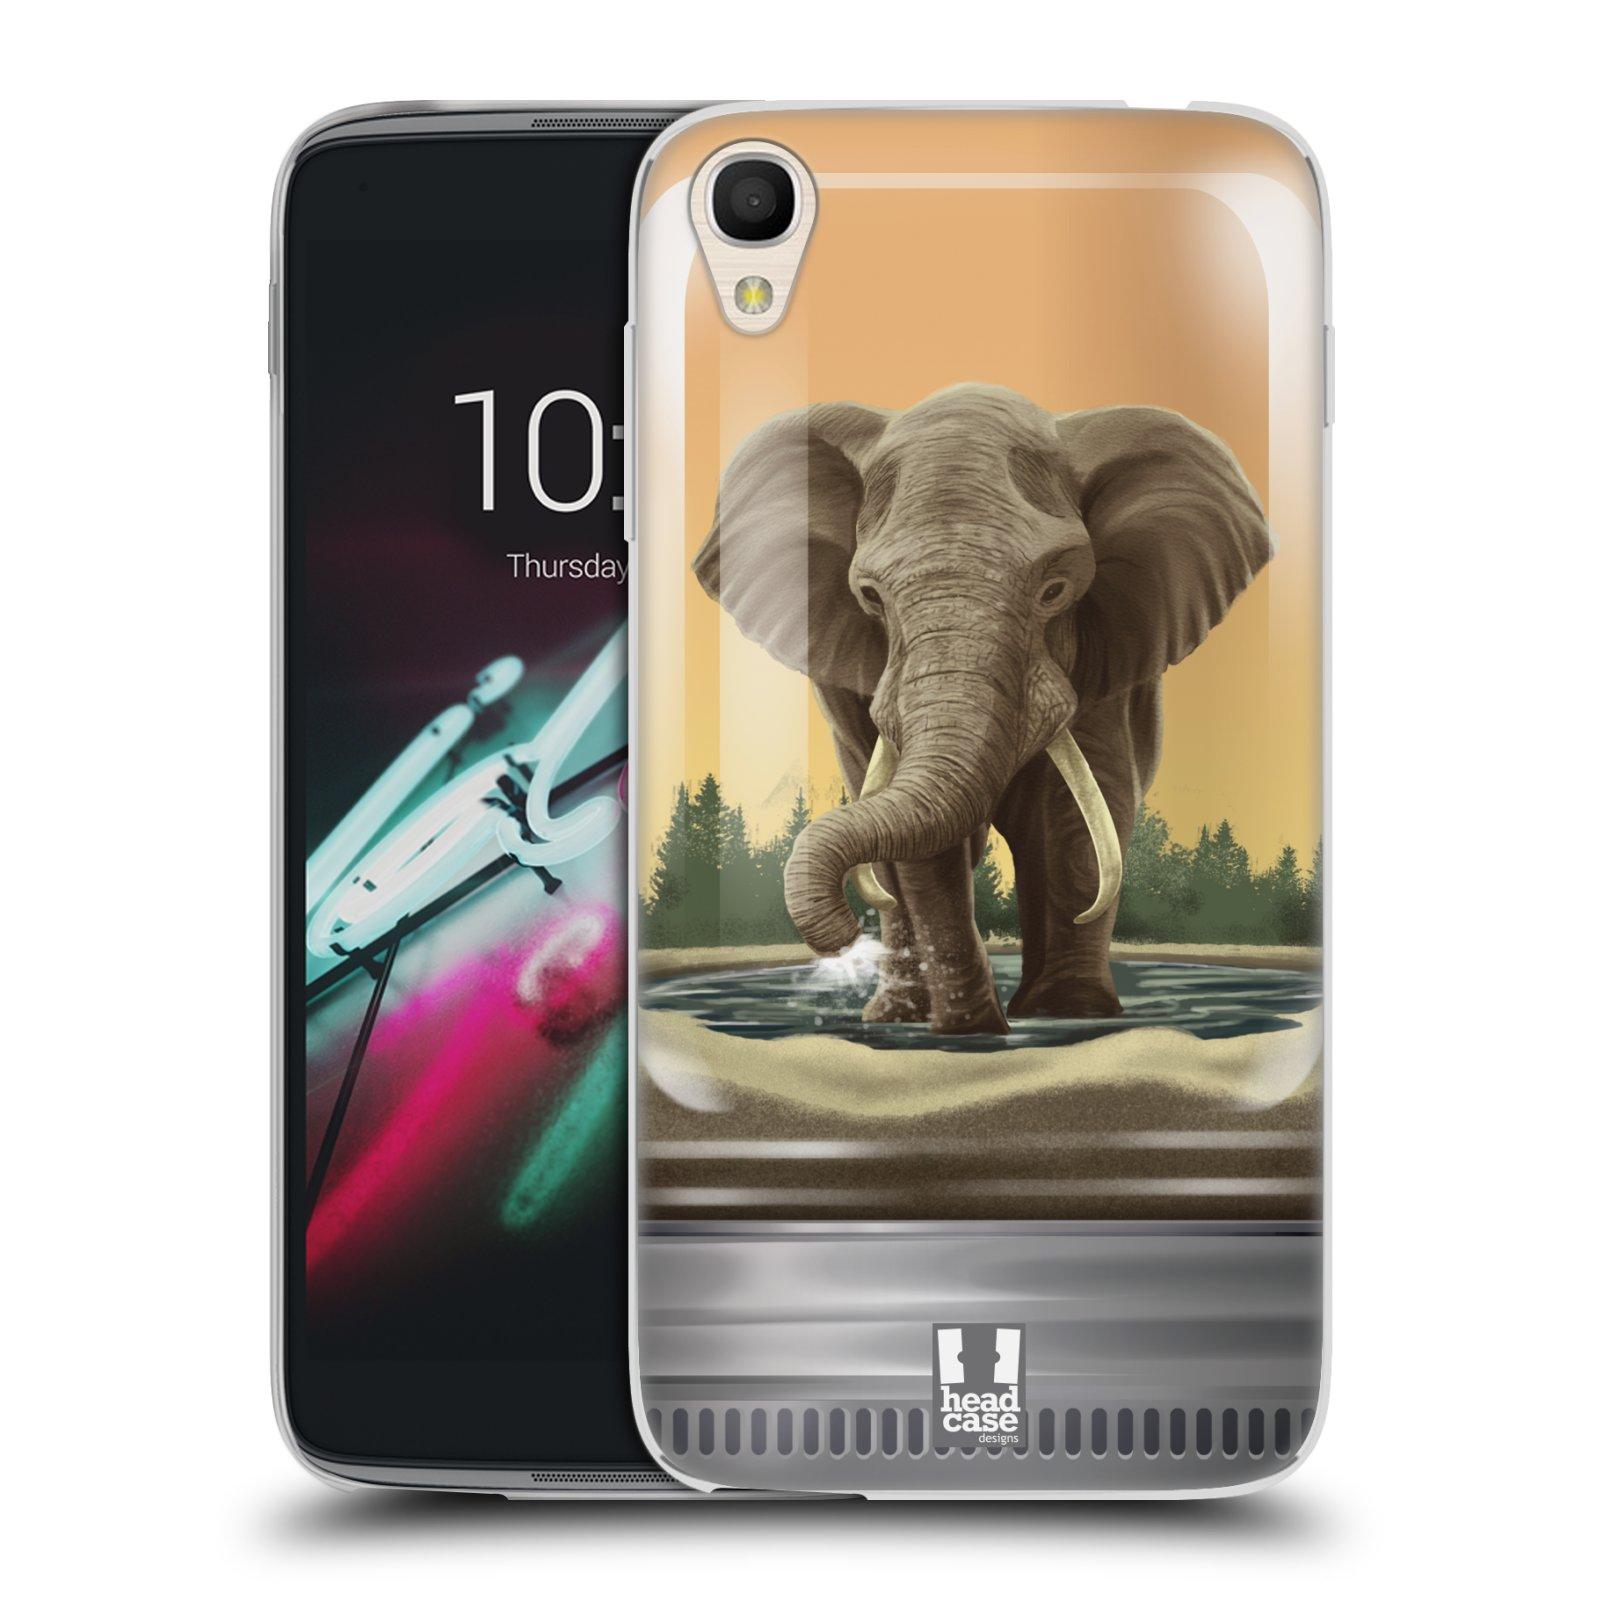 HEAD CASE silikonový obal na mobil Alcatel Idol 3 OT-6039Y (4.7) vzor Zvířátka v těžítku slon